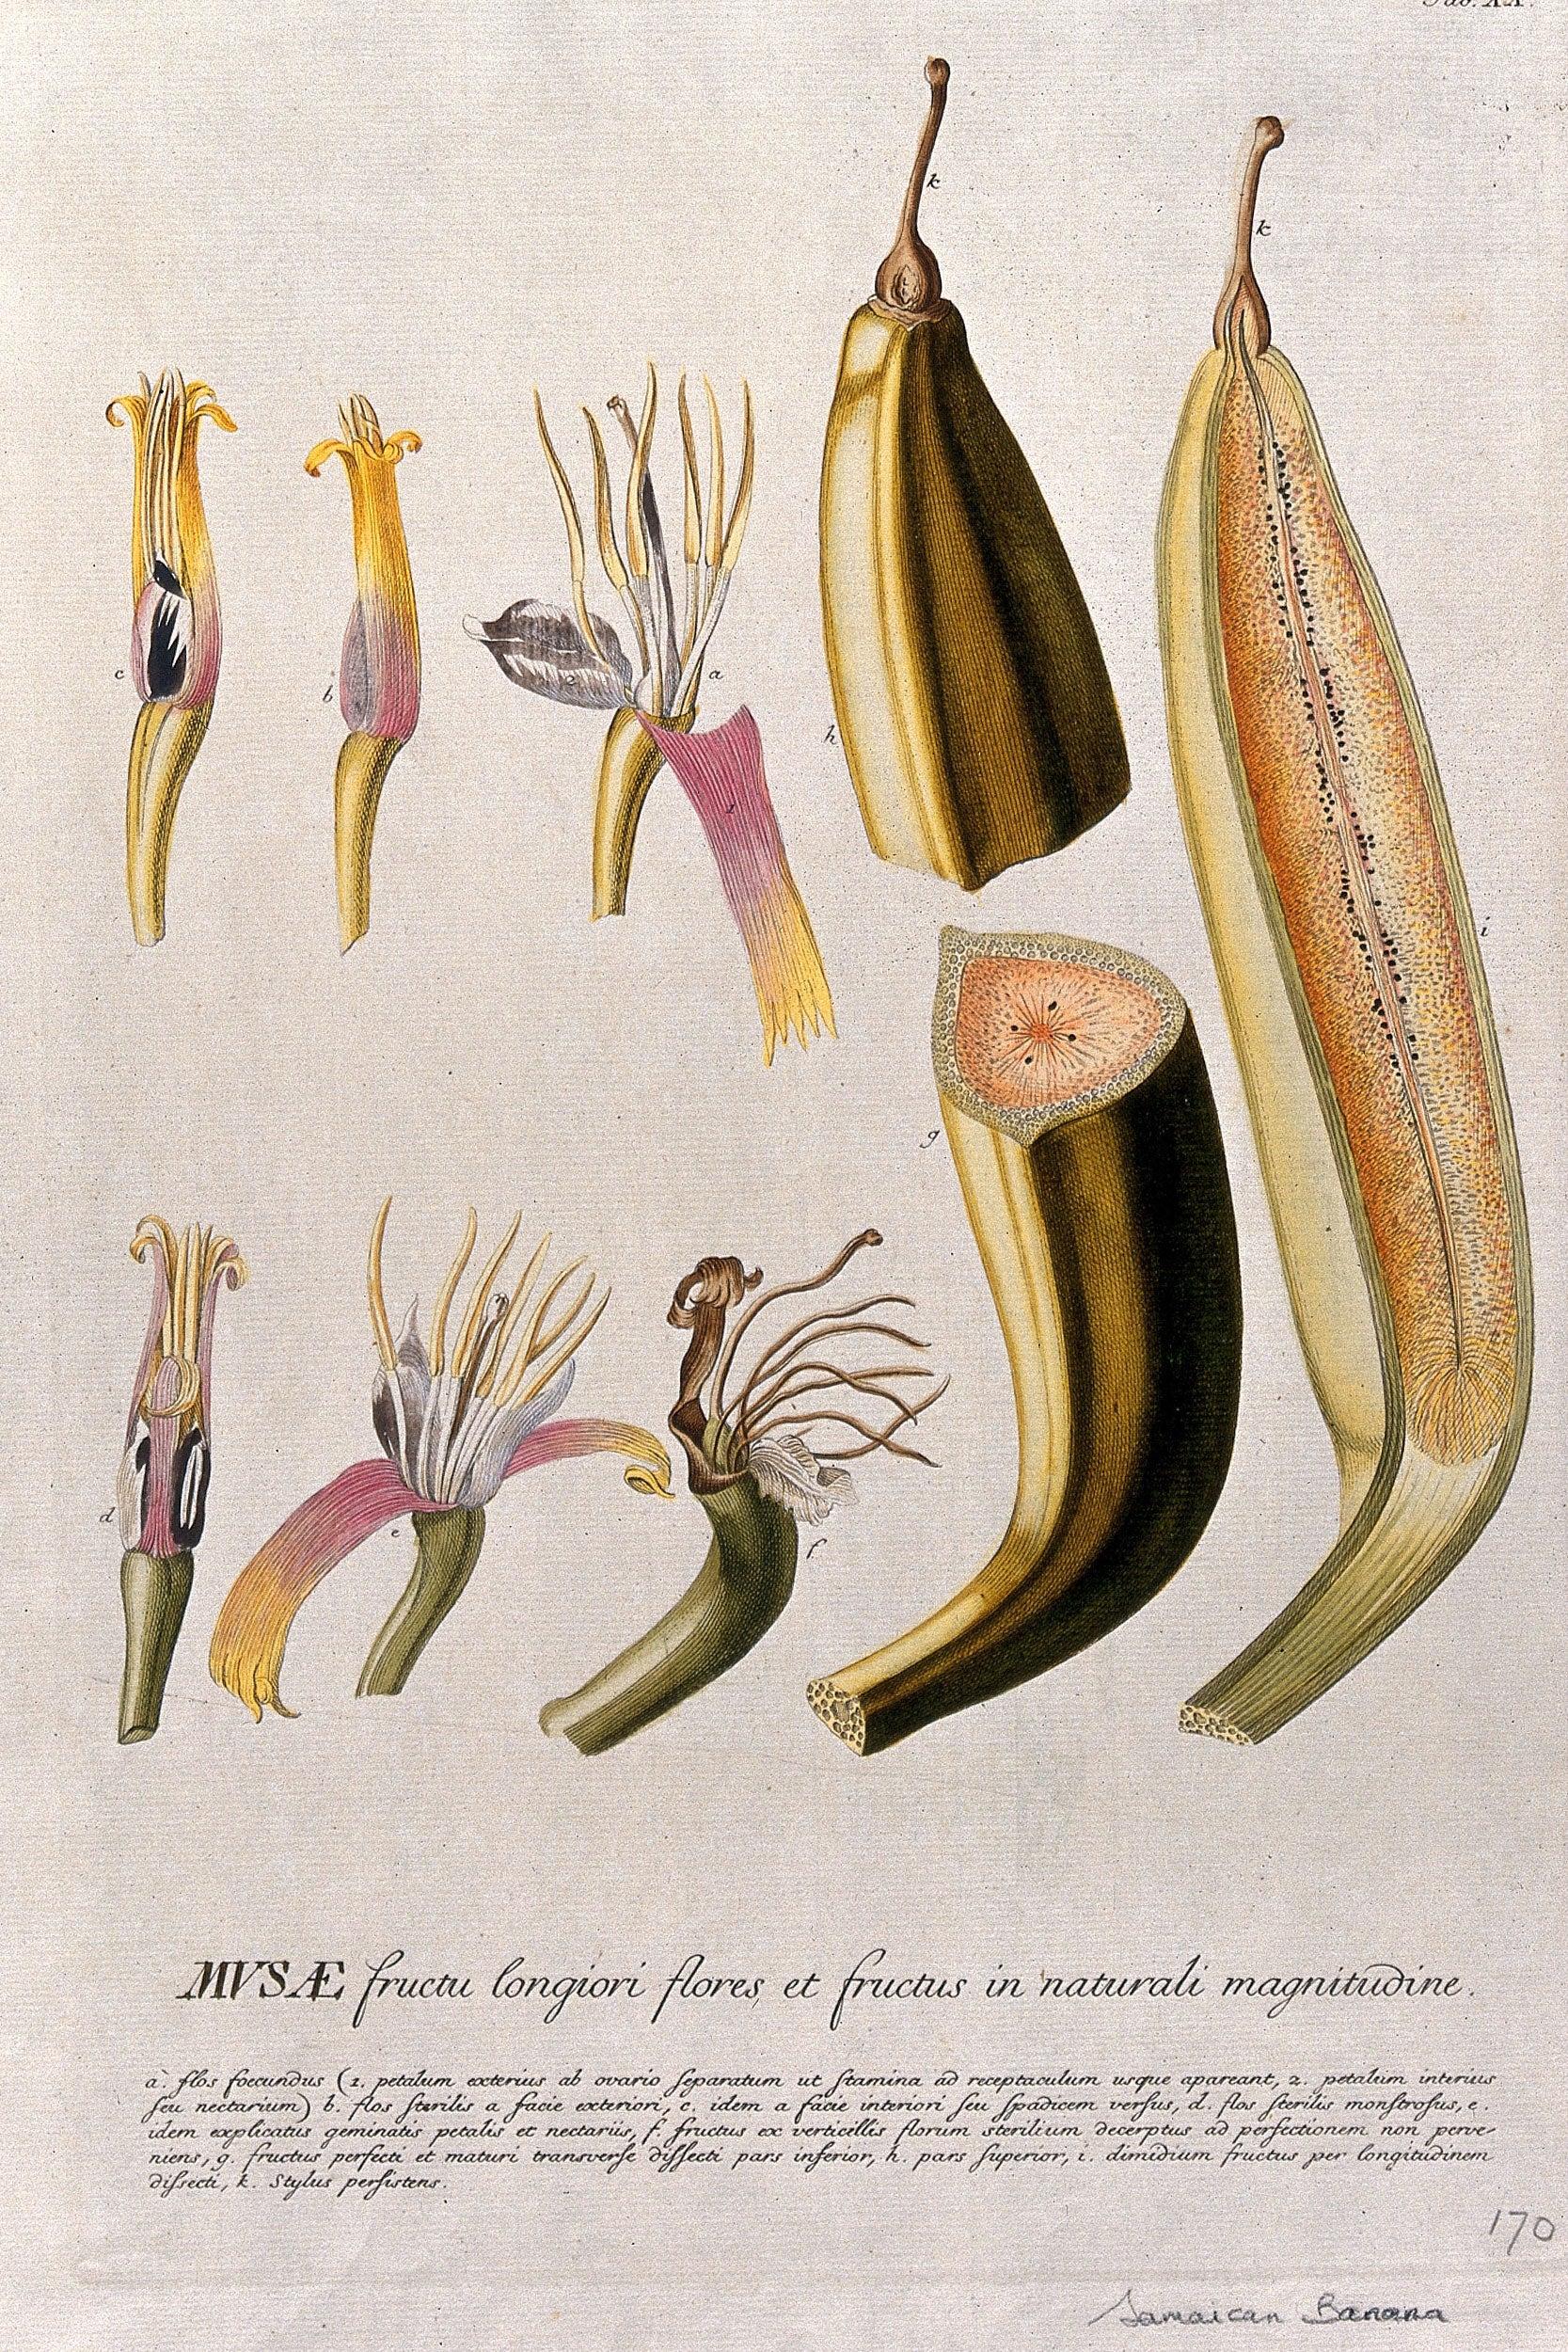 Illustration of Plantain Banana